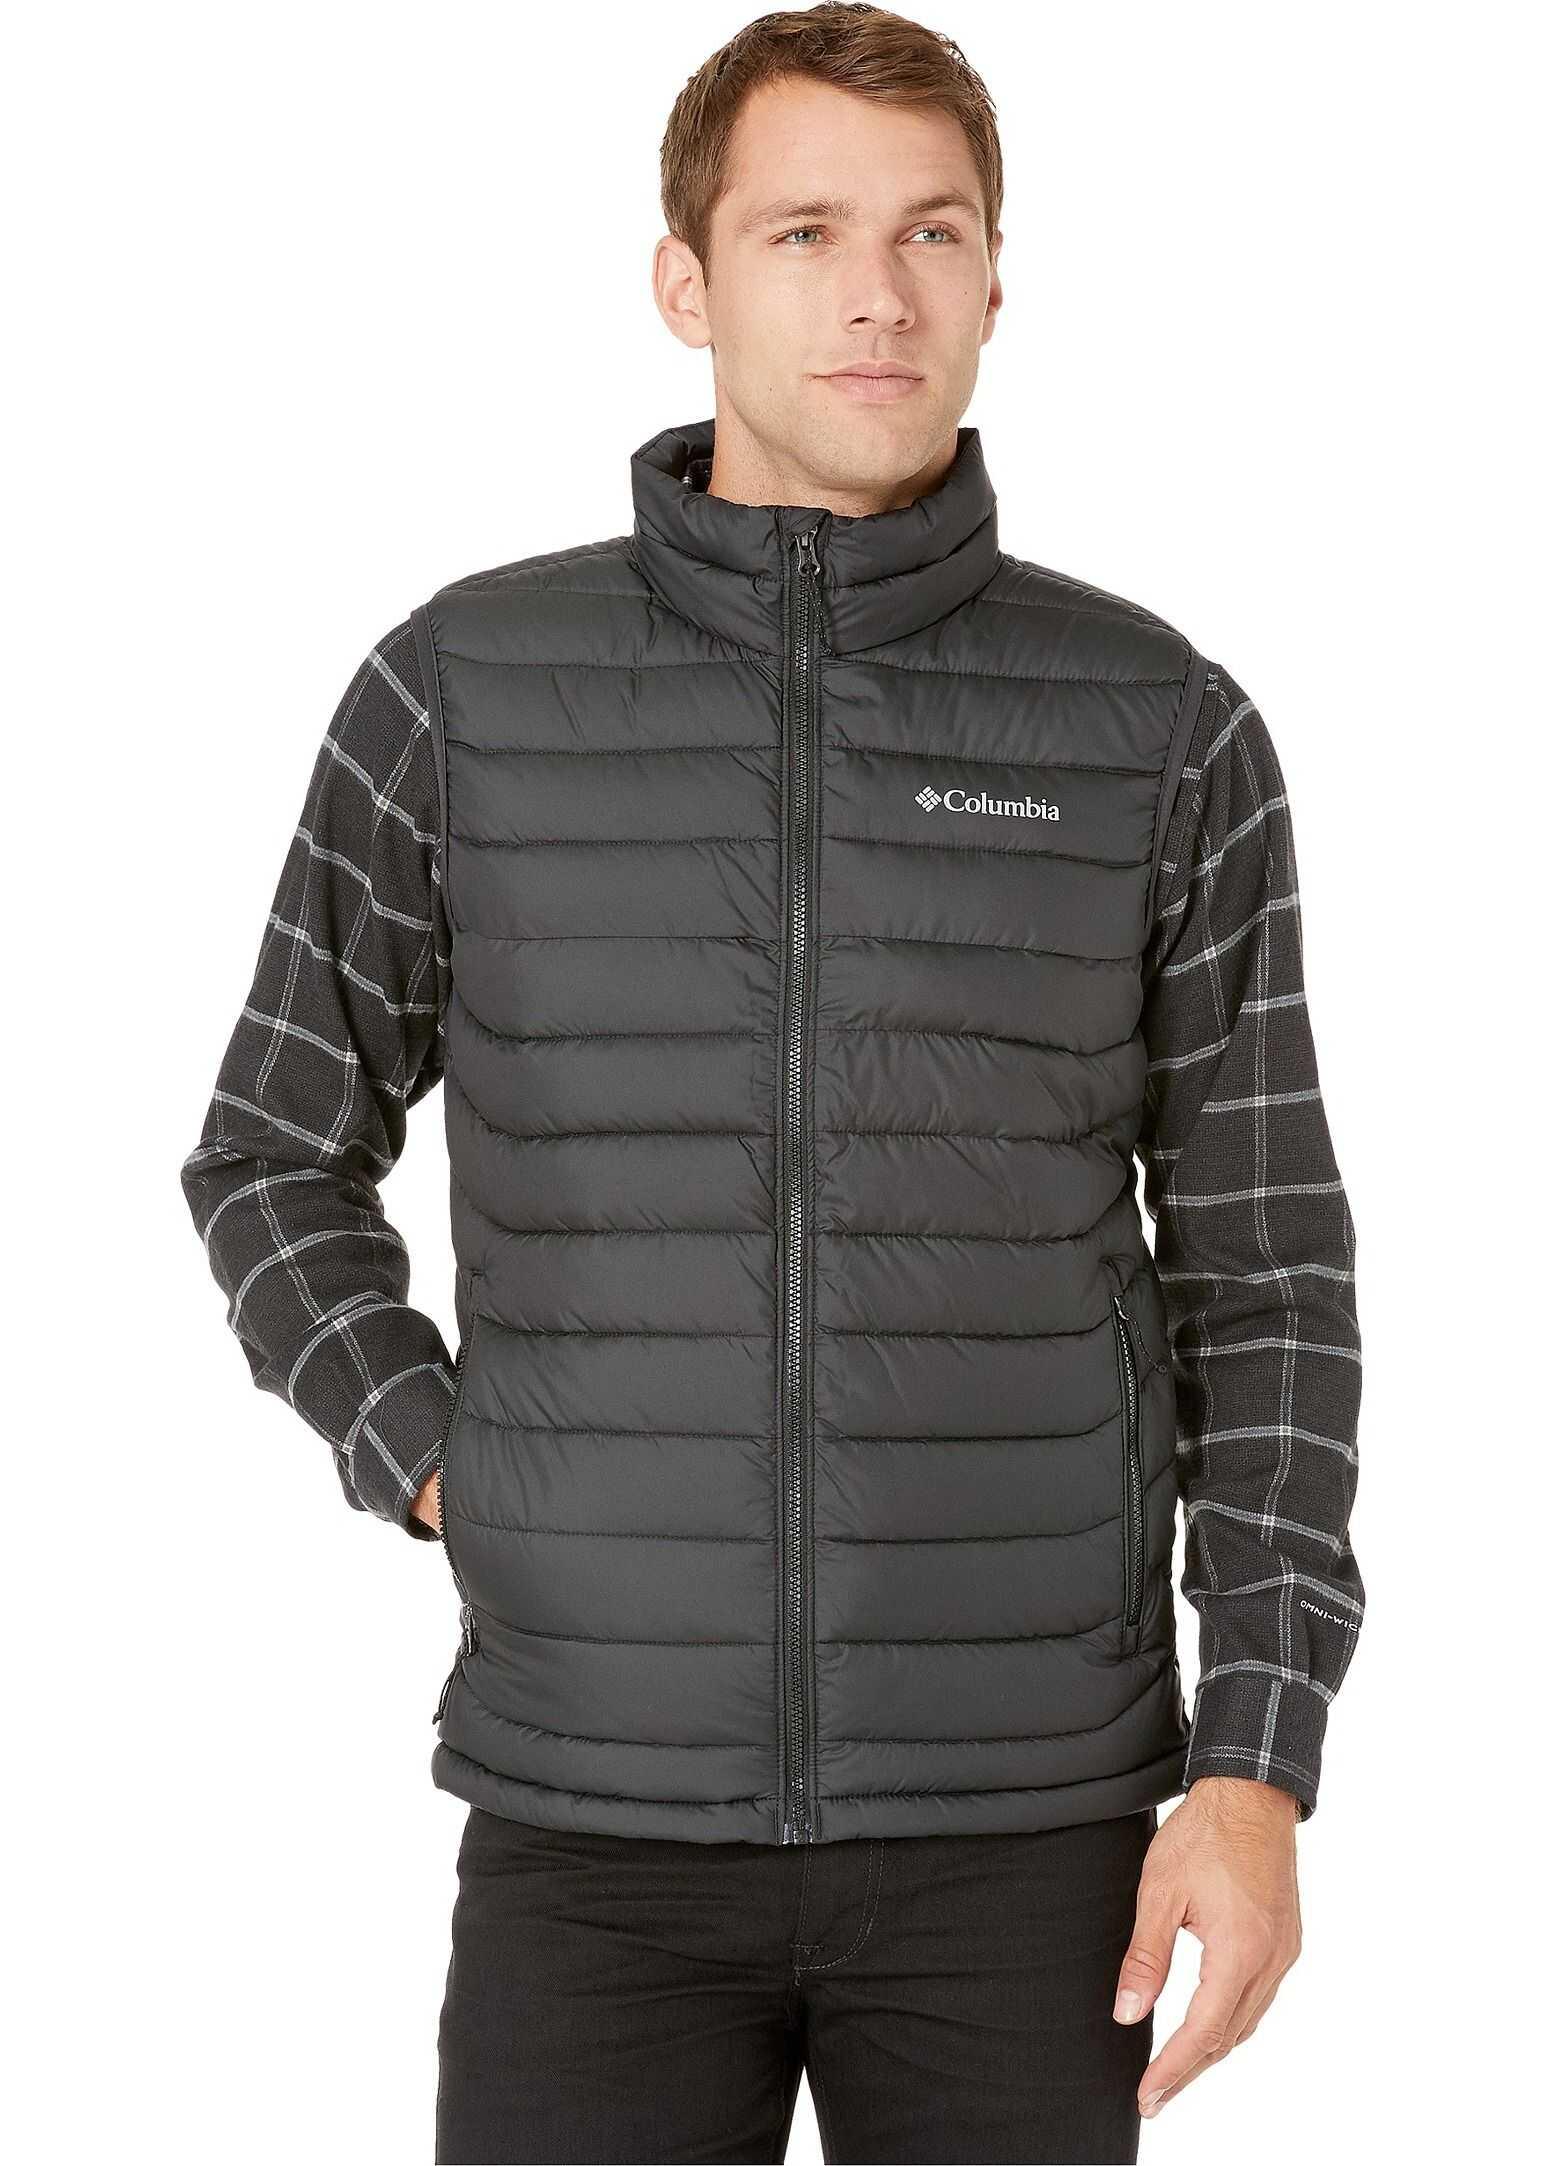 Columbia Powder Lite™ Vest Black